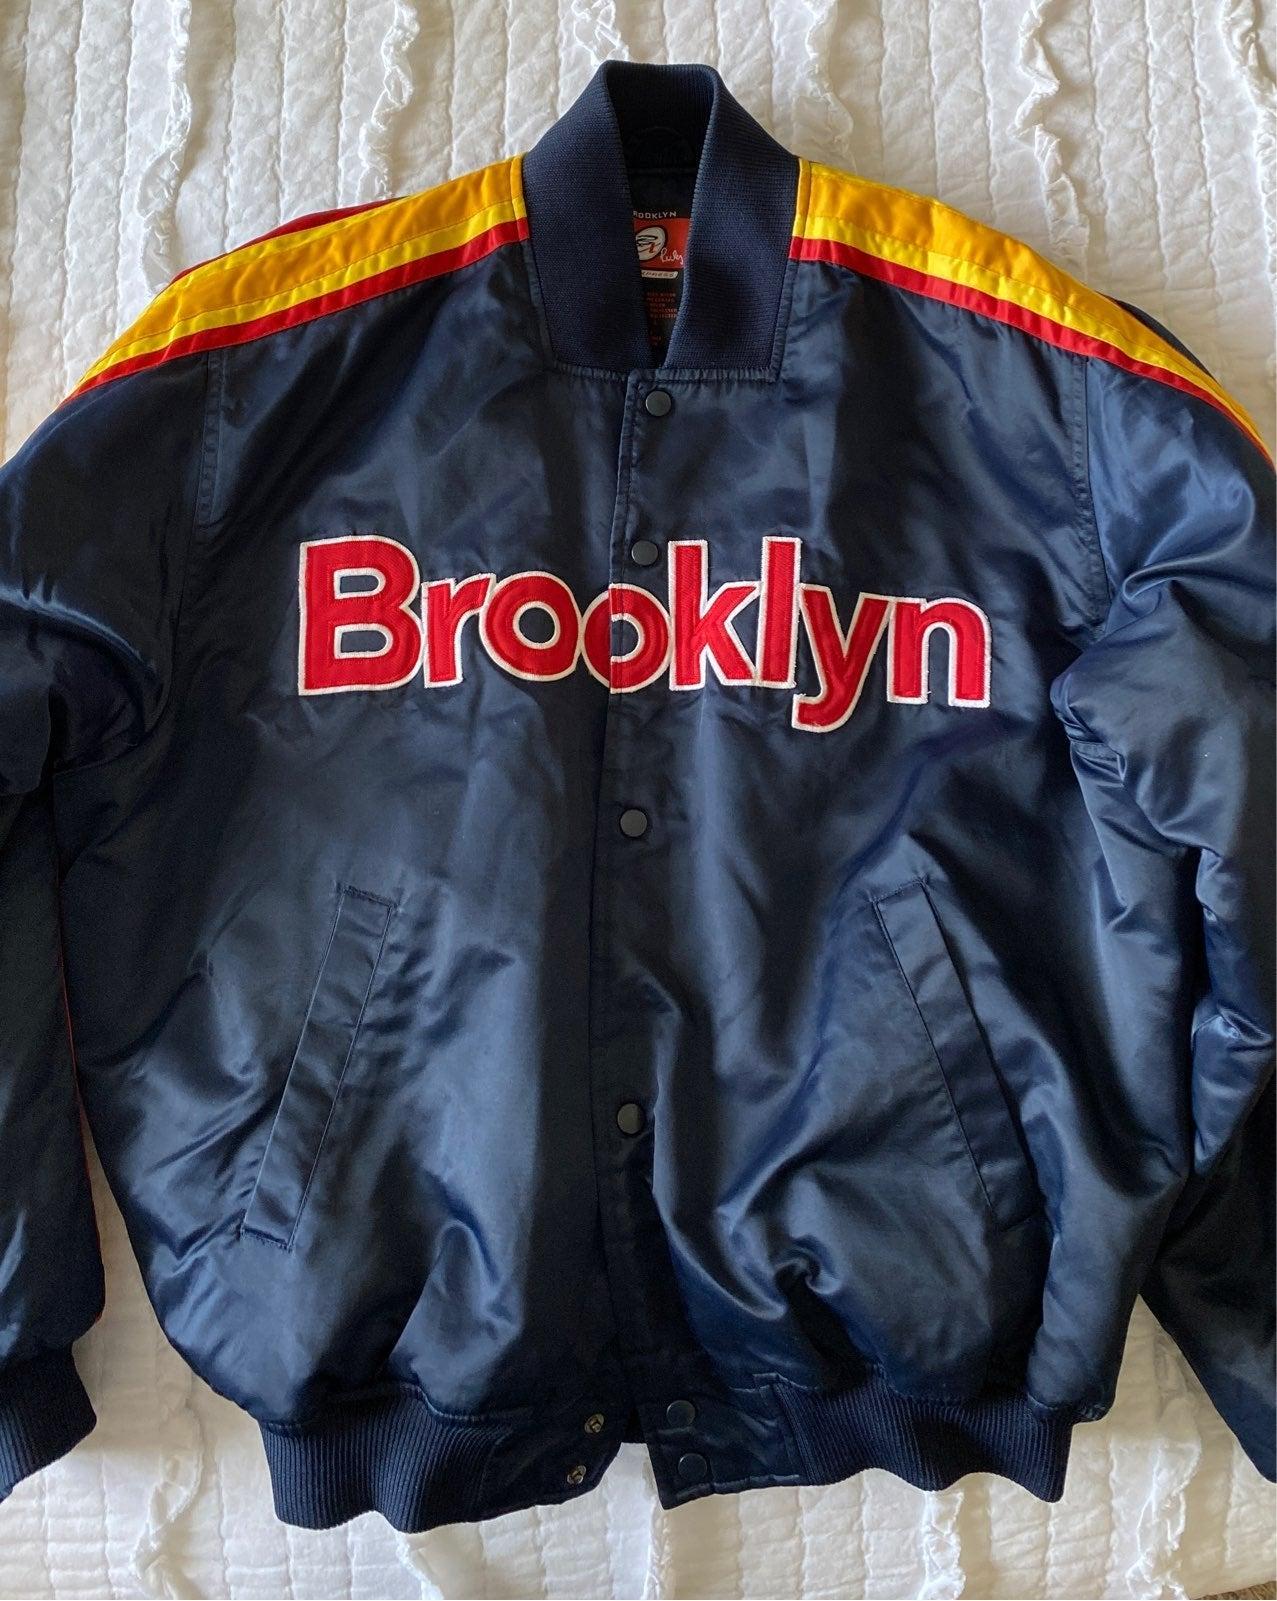 Brooklyn Express Letter/Bomber Jacket